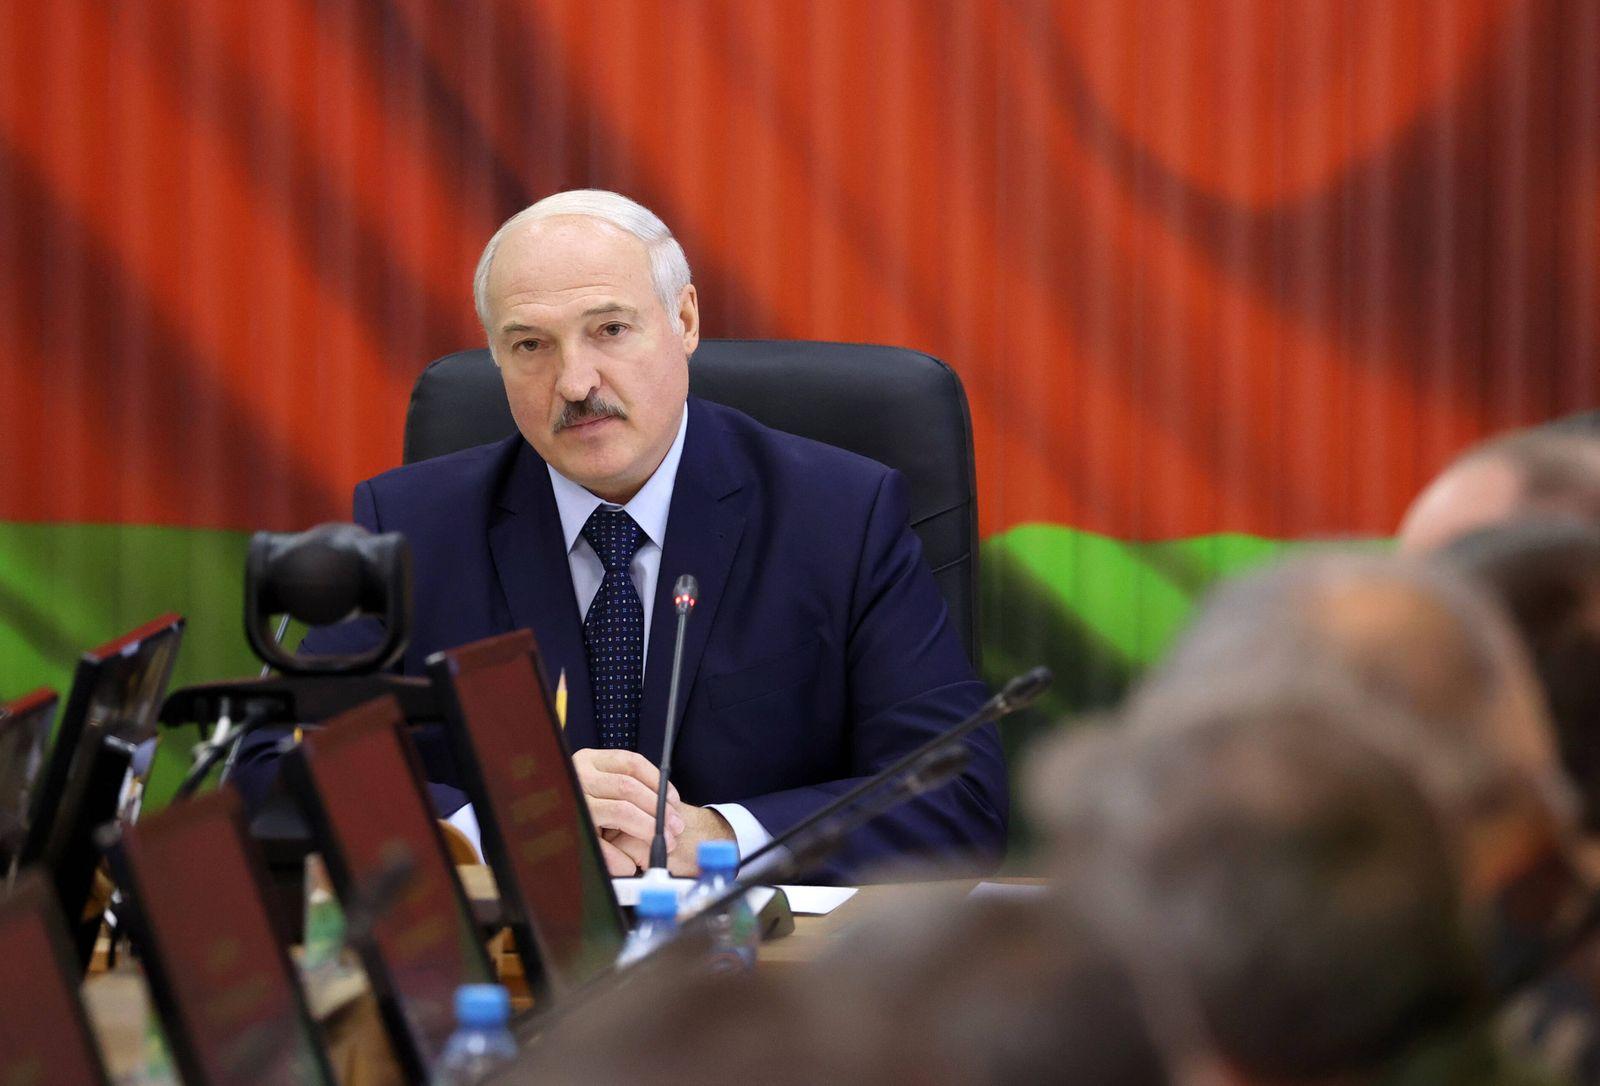 News Bilder des Tages MINSK, BELARUS - AUGUST 15, 2020: Belarus President Alexander Lukashenko holds a meeting in the St